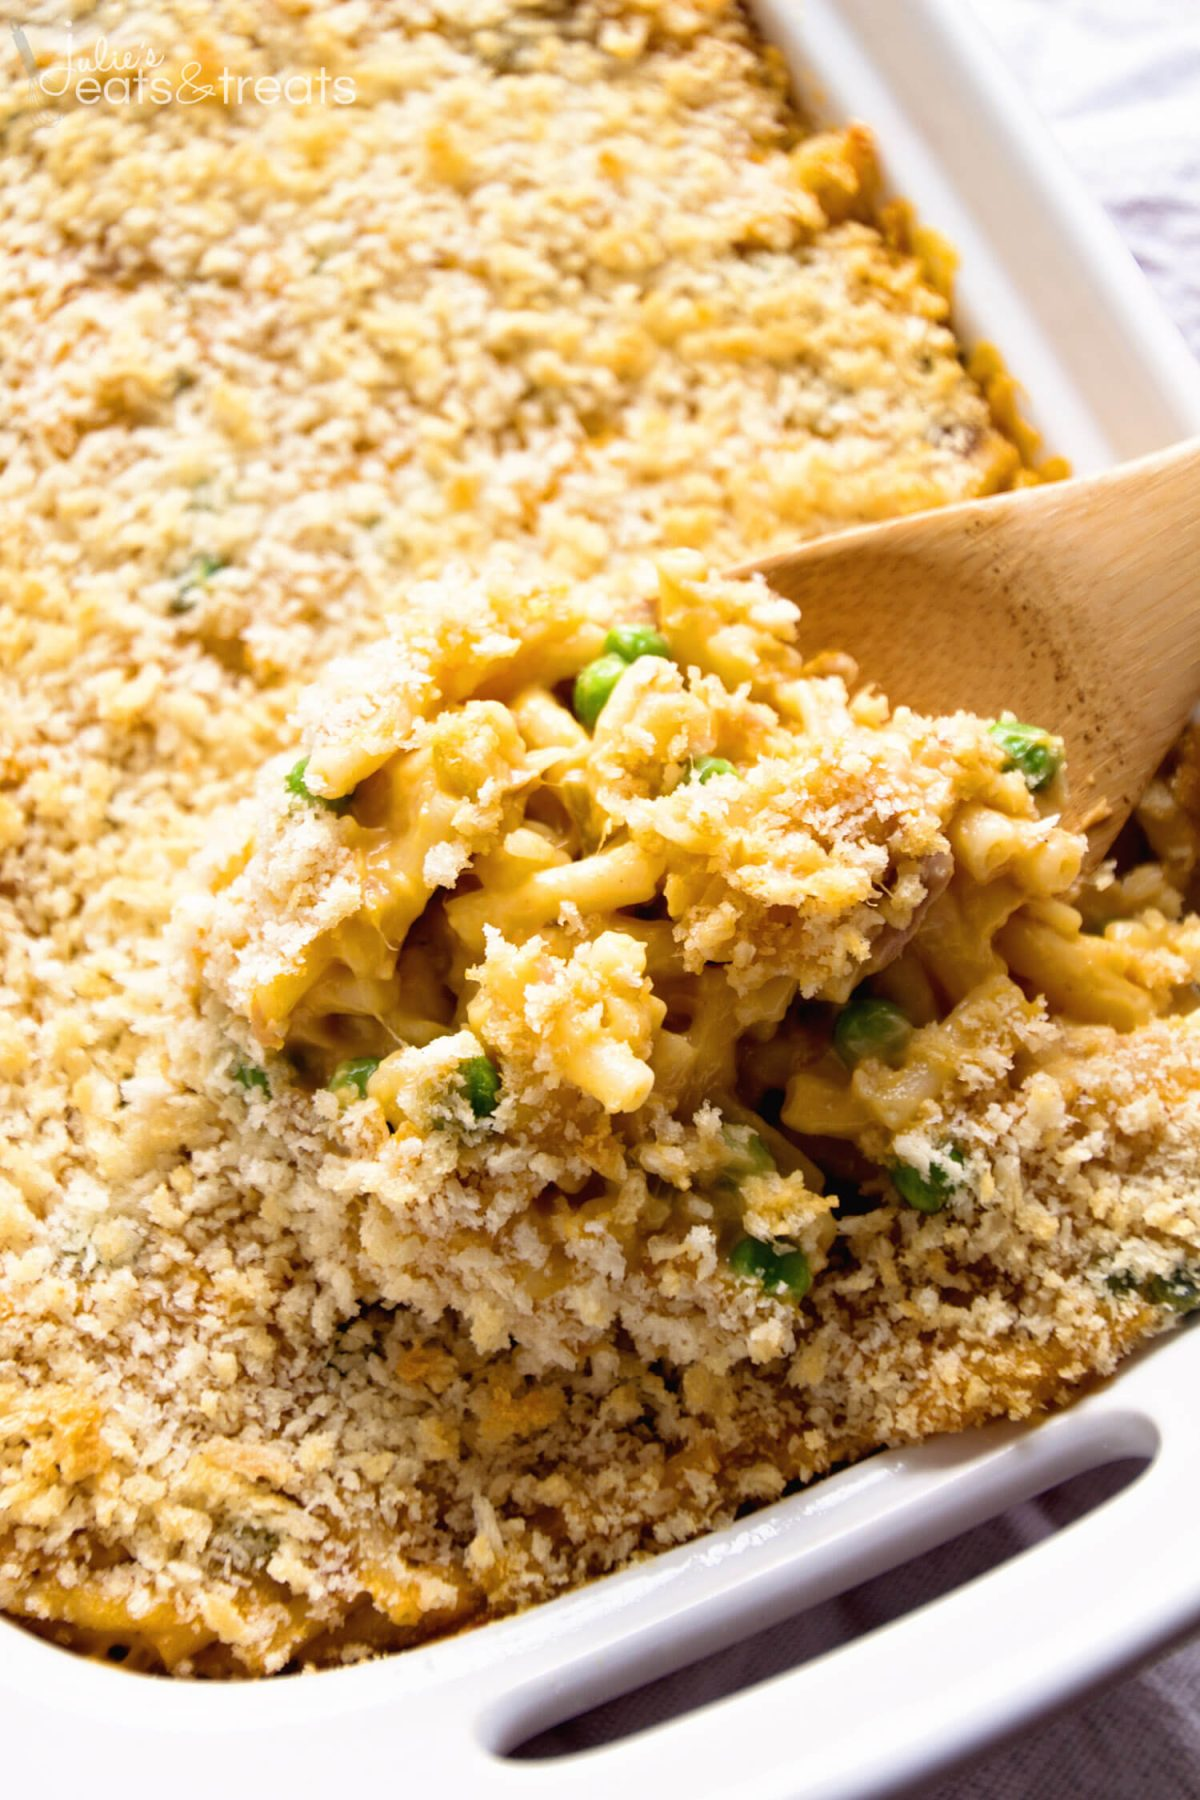 Tuna Macaroni Casserole Recipe ~ Traditional, Comforting Casserole From Grandma's Recipe Box! Kids Will Love This Dressed Up Mac & Cheese Casserole Recipe!